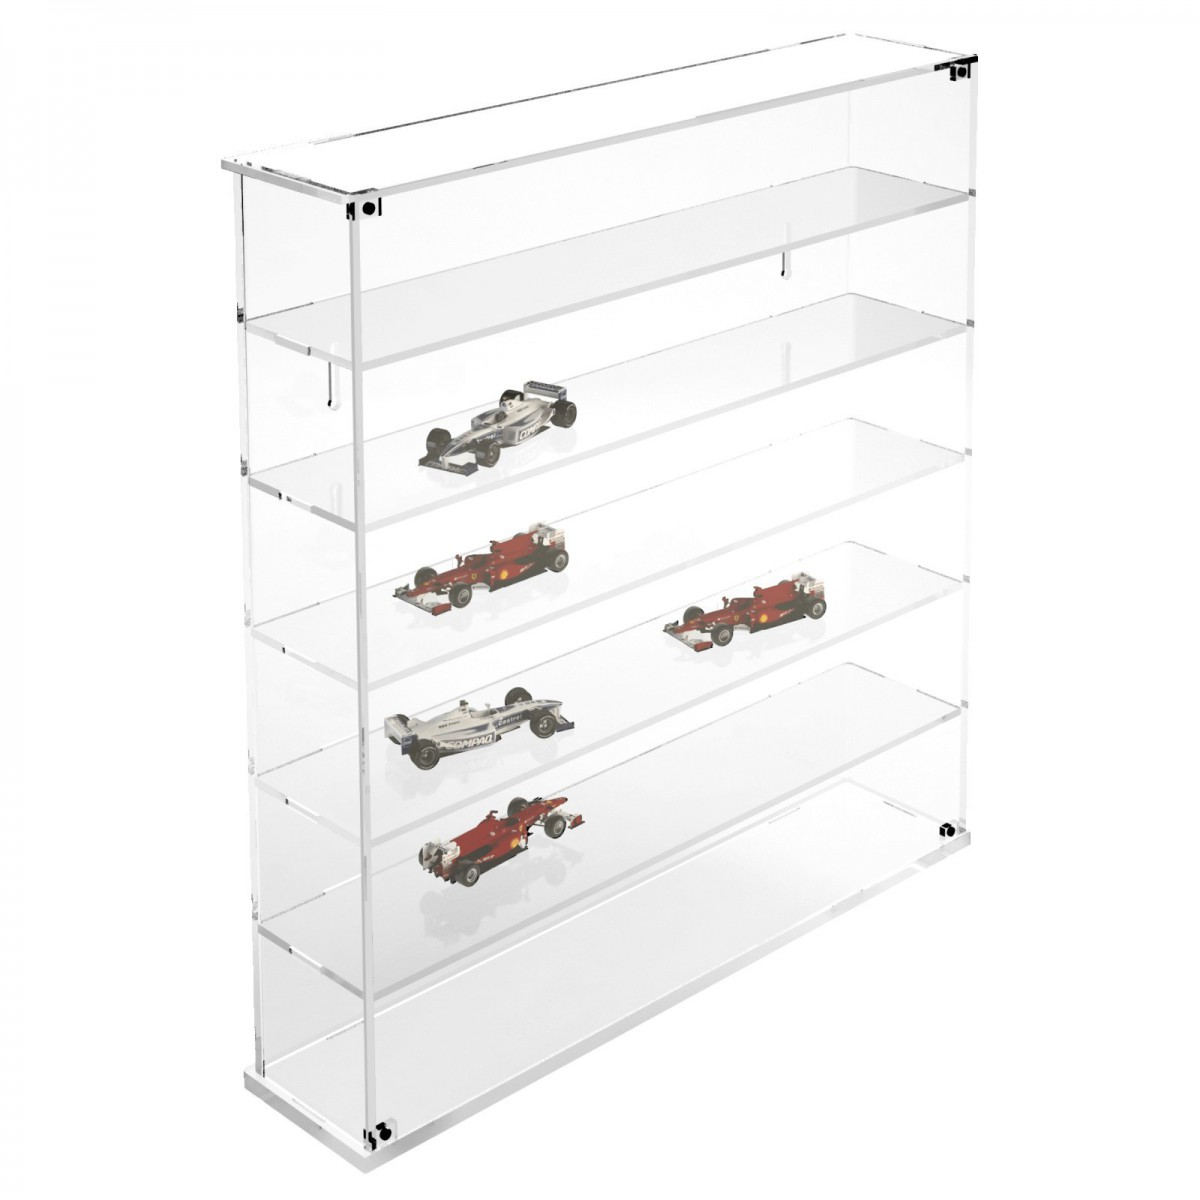 E-364 BAC - Bacheca/Vetrina in plexiglass trasparente scala 1:43 a 6 ripiani - Misure totali: 53x12x h55 cm